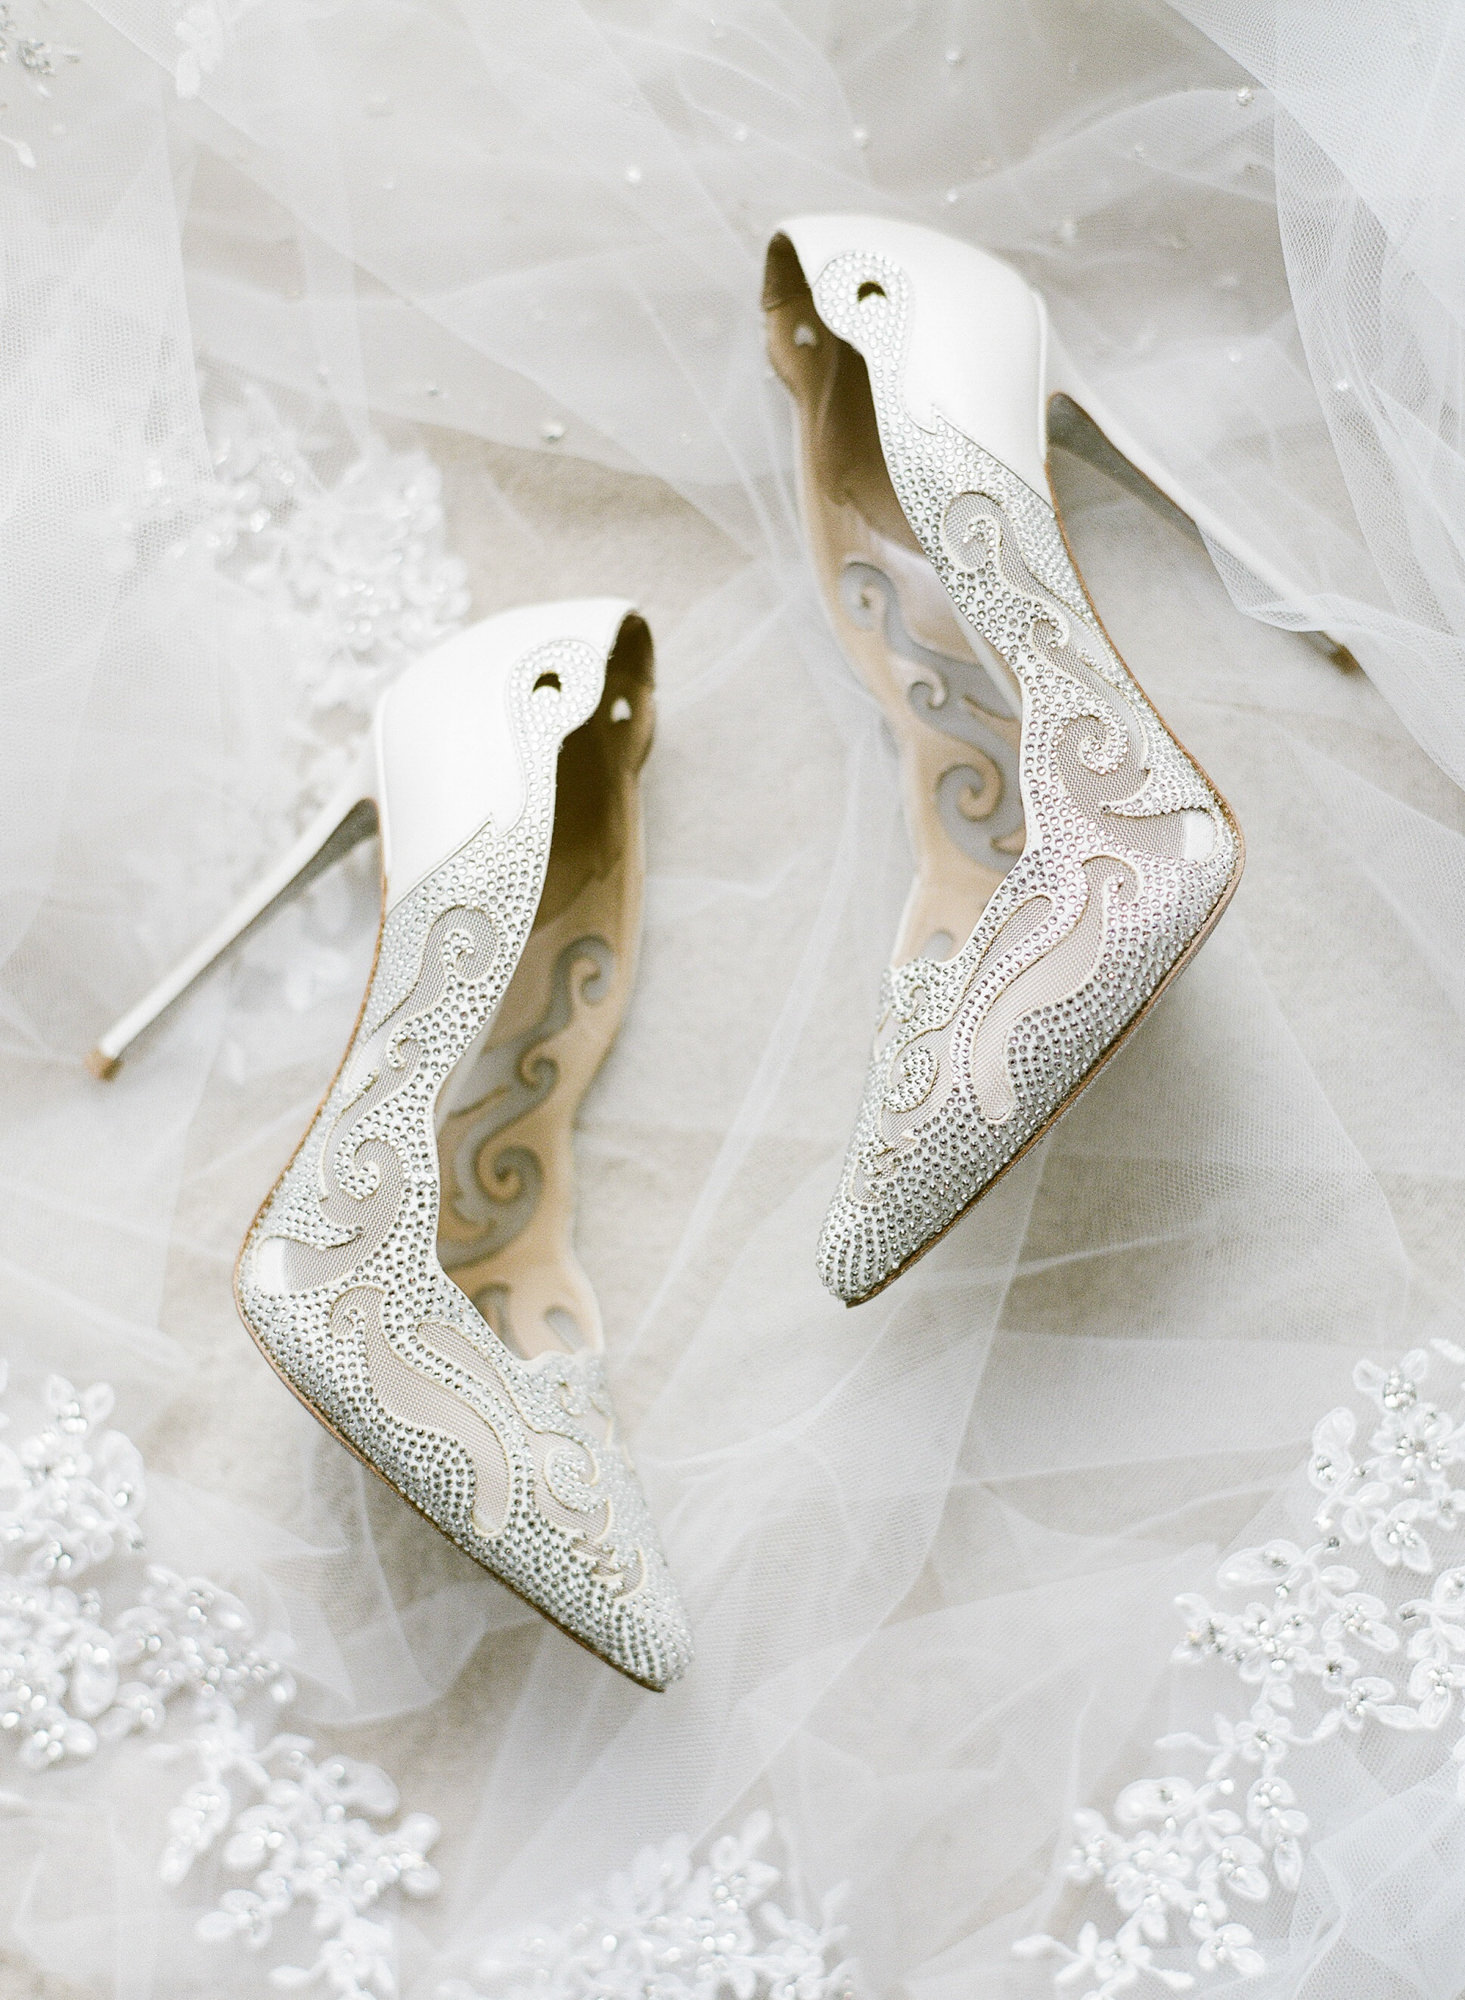 rena-caovilla-beaded-white-pumps-with-scalloped-edge-worlds-best-wedding-photos-greg-finck-france-wedding-photographers